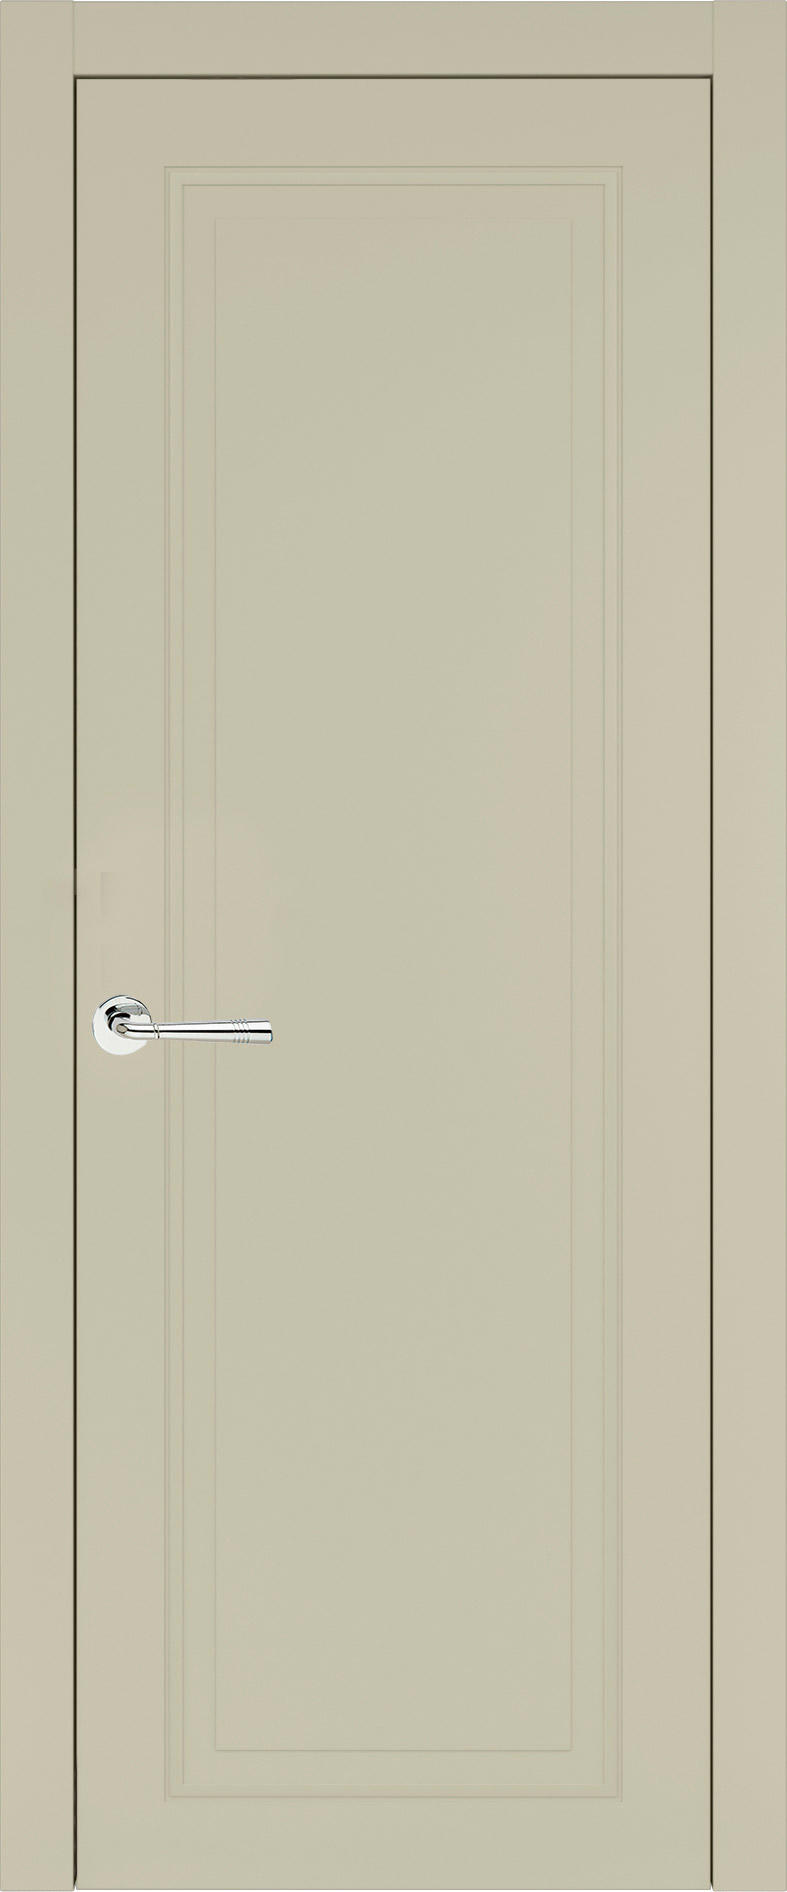 Domenica Neo Classic цвет - Серо-оливковая эмаль (RAL 7032) Без стекла (ДГ)